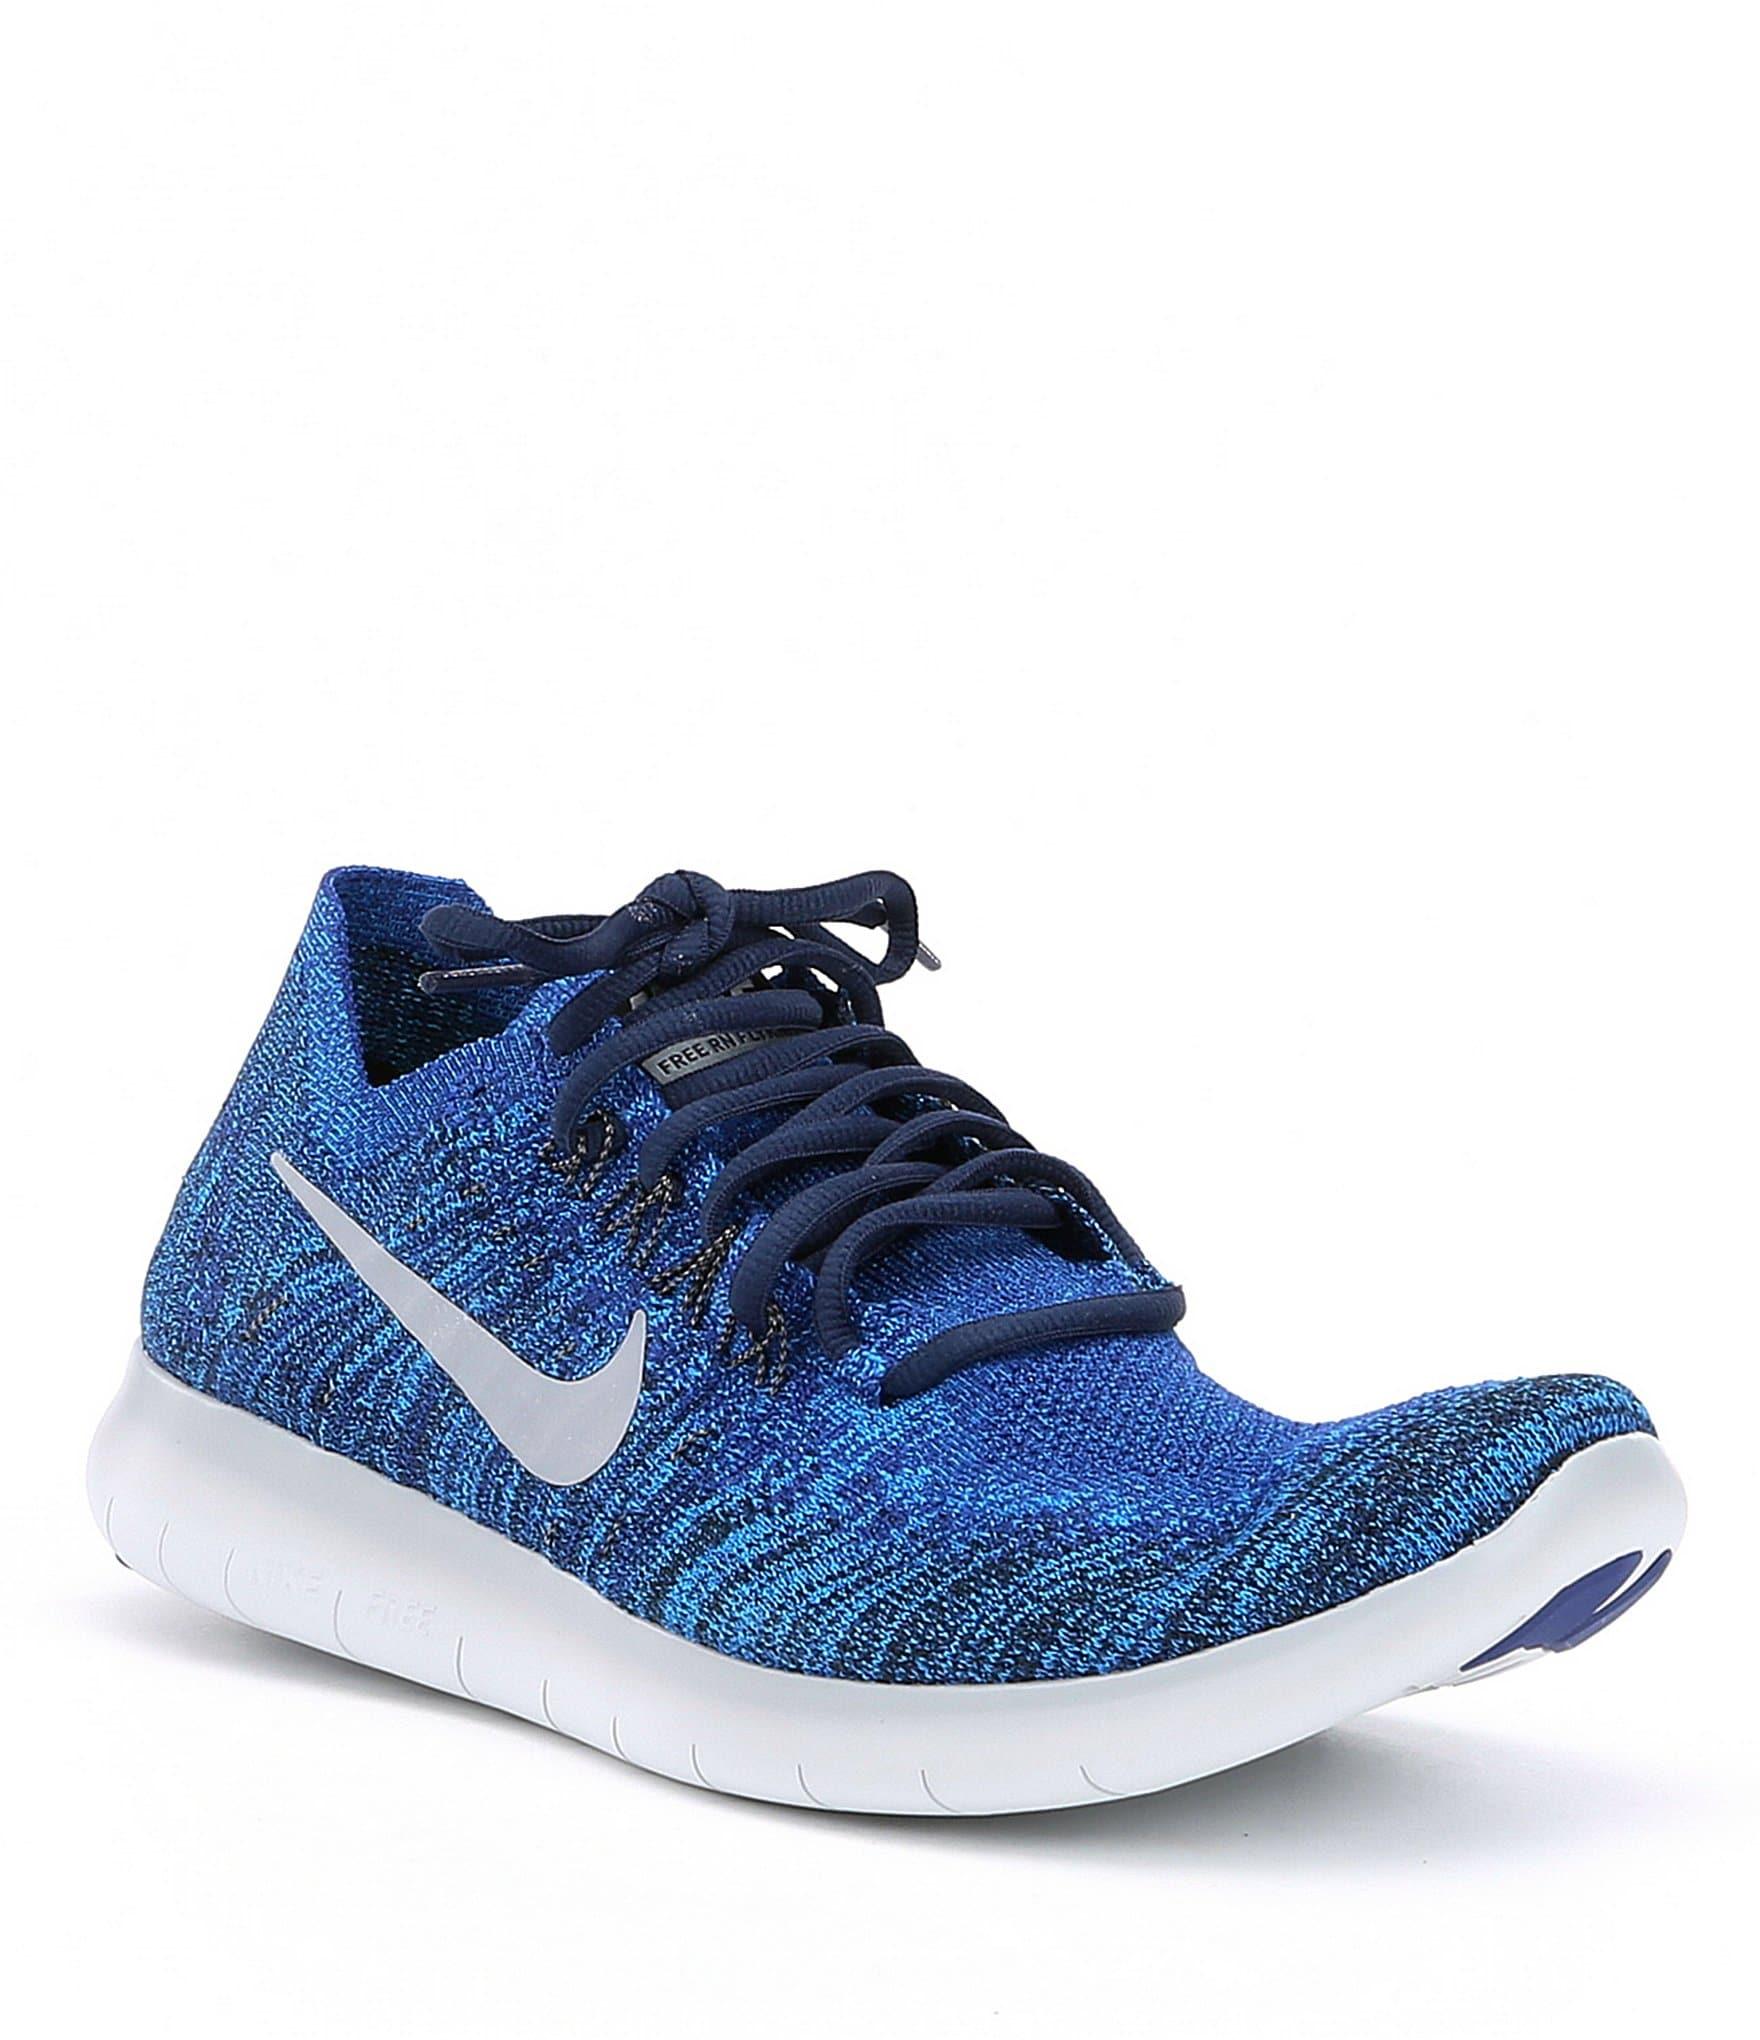 Nike Free Run Running Shoes Review